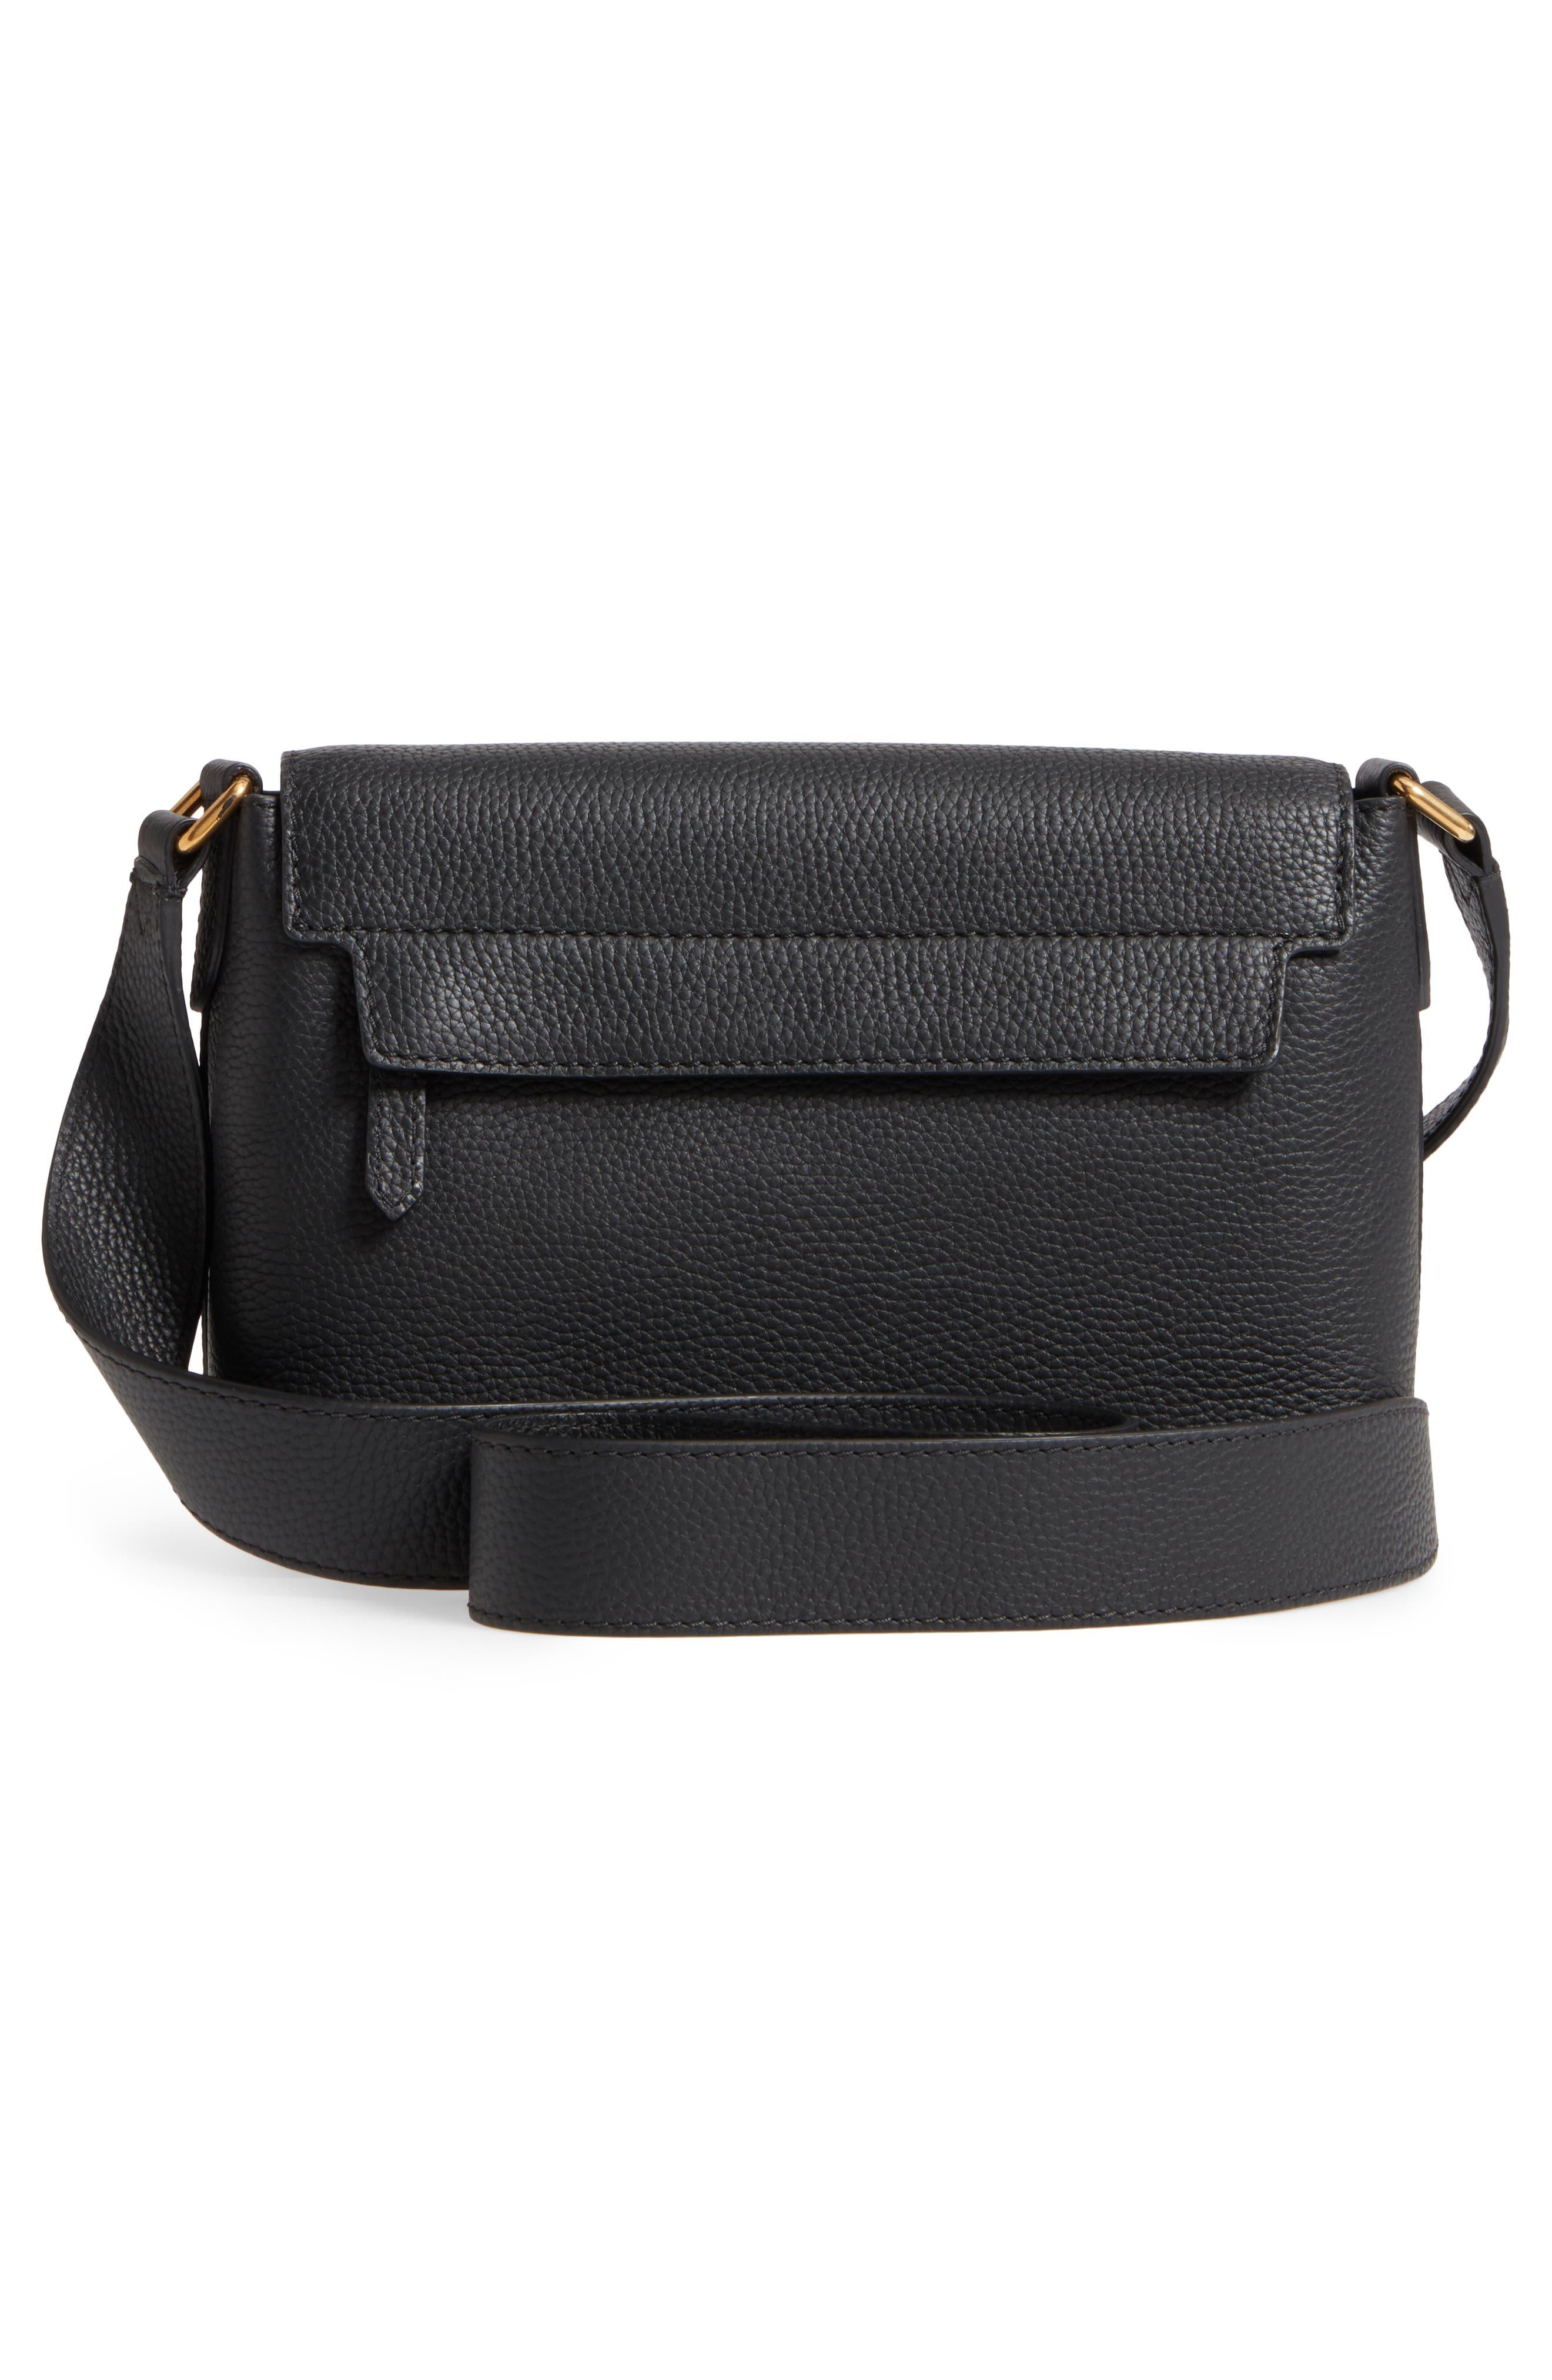 Alternate Image 3  - Burberry Small Burleigh Leather Crossbody Bag